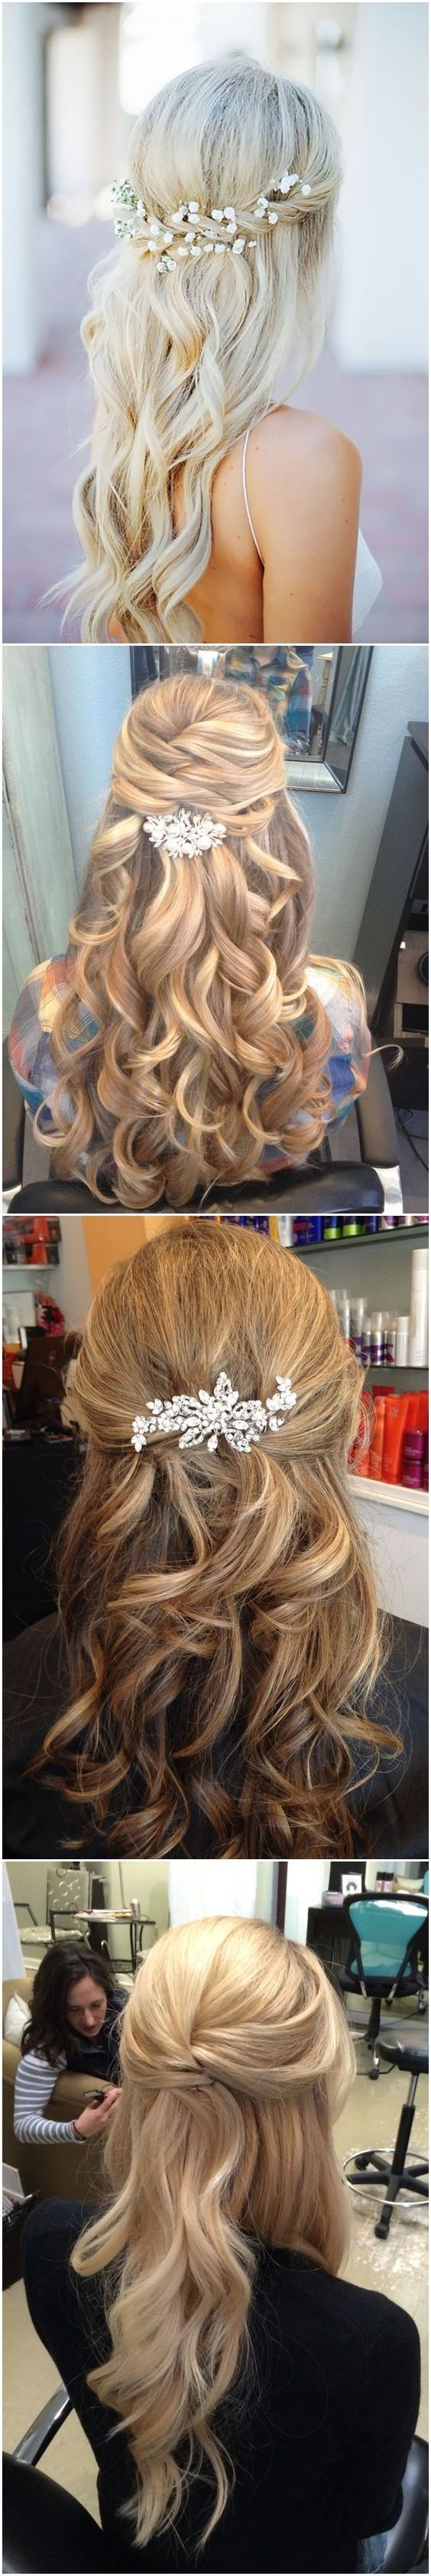 Miqueue coiffure mariage peinados pinterest hair loss